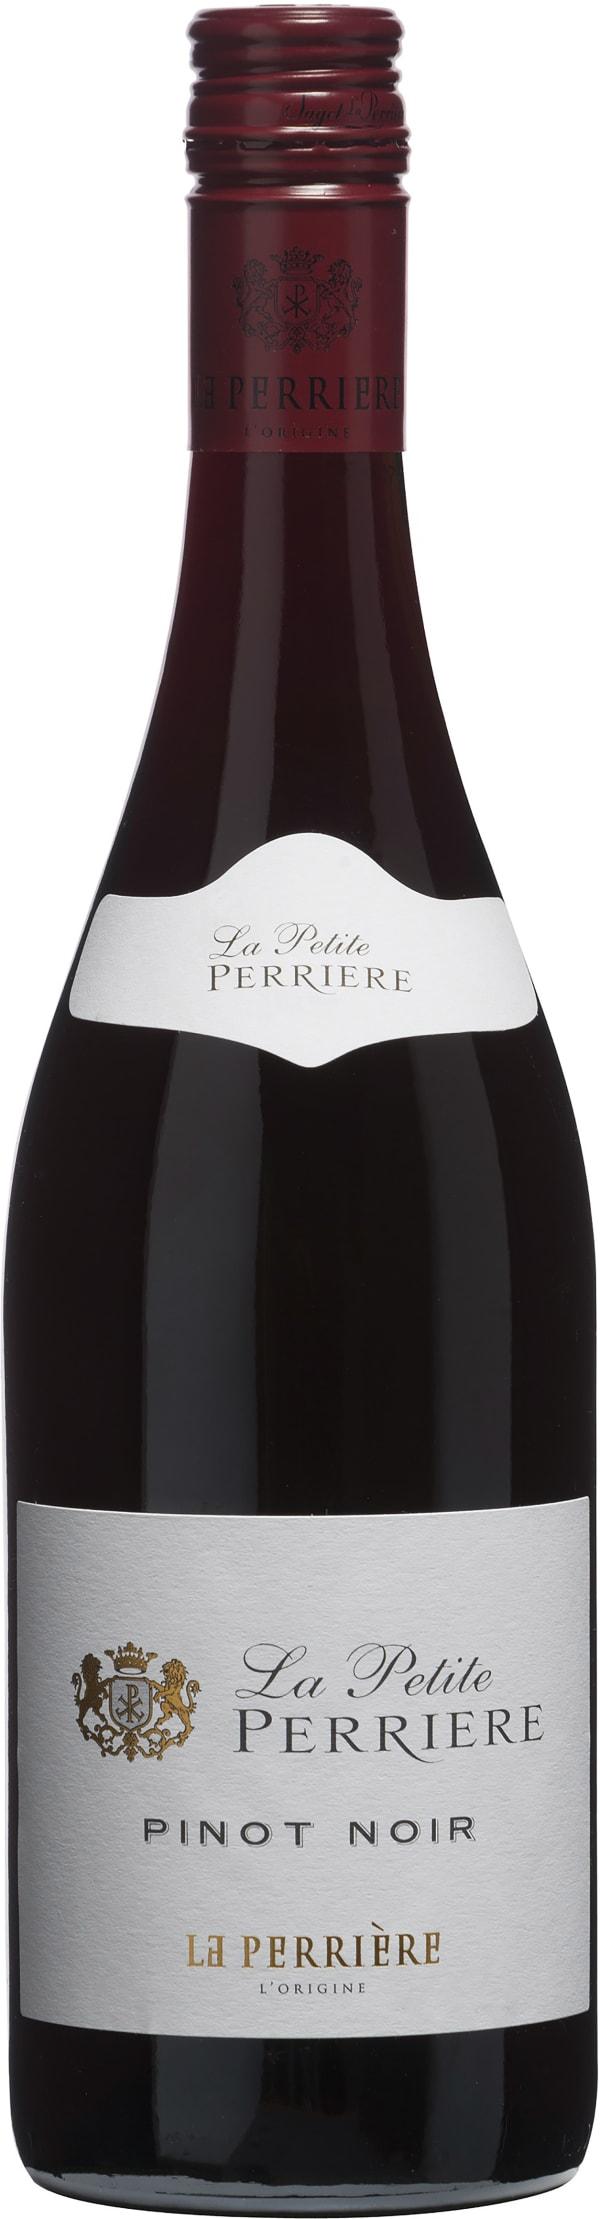 La Petite Perriere Pinot Noir 2019